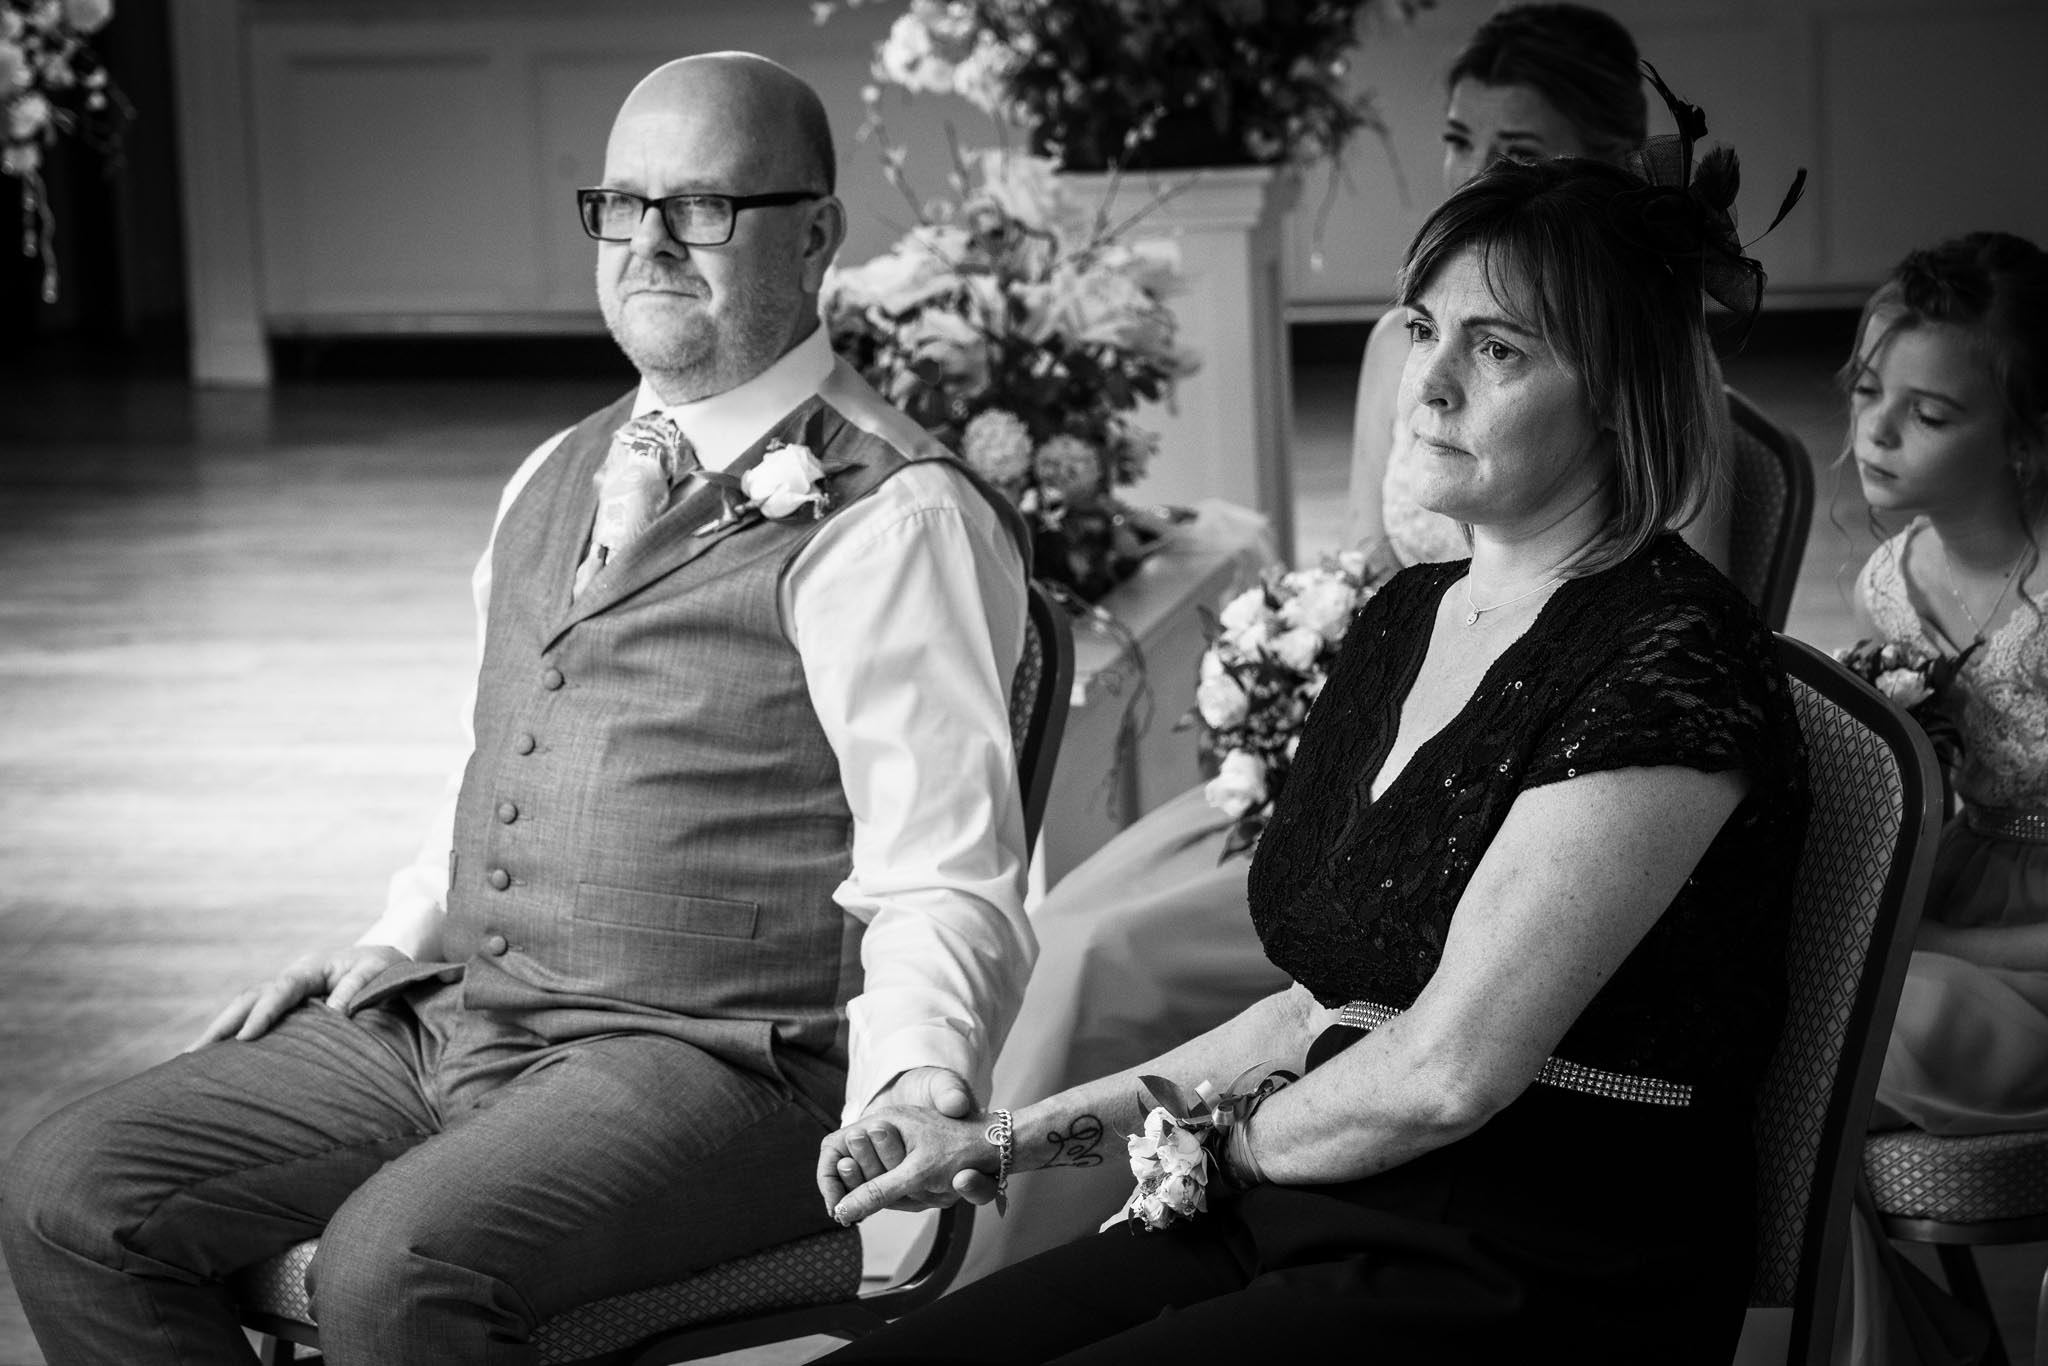 310-Ceremony-Luke-Yasmin-The-Rayleigh-Club-Wedding-Photography.jpg